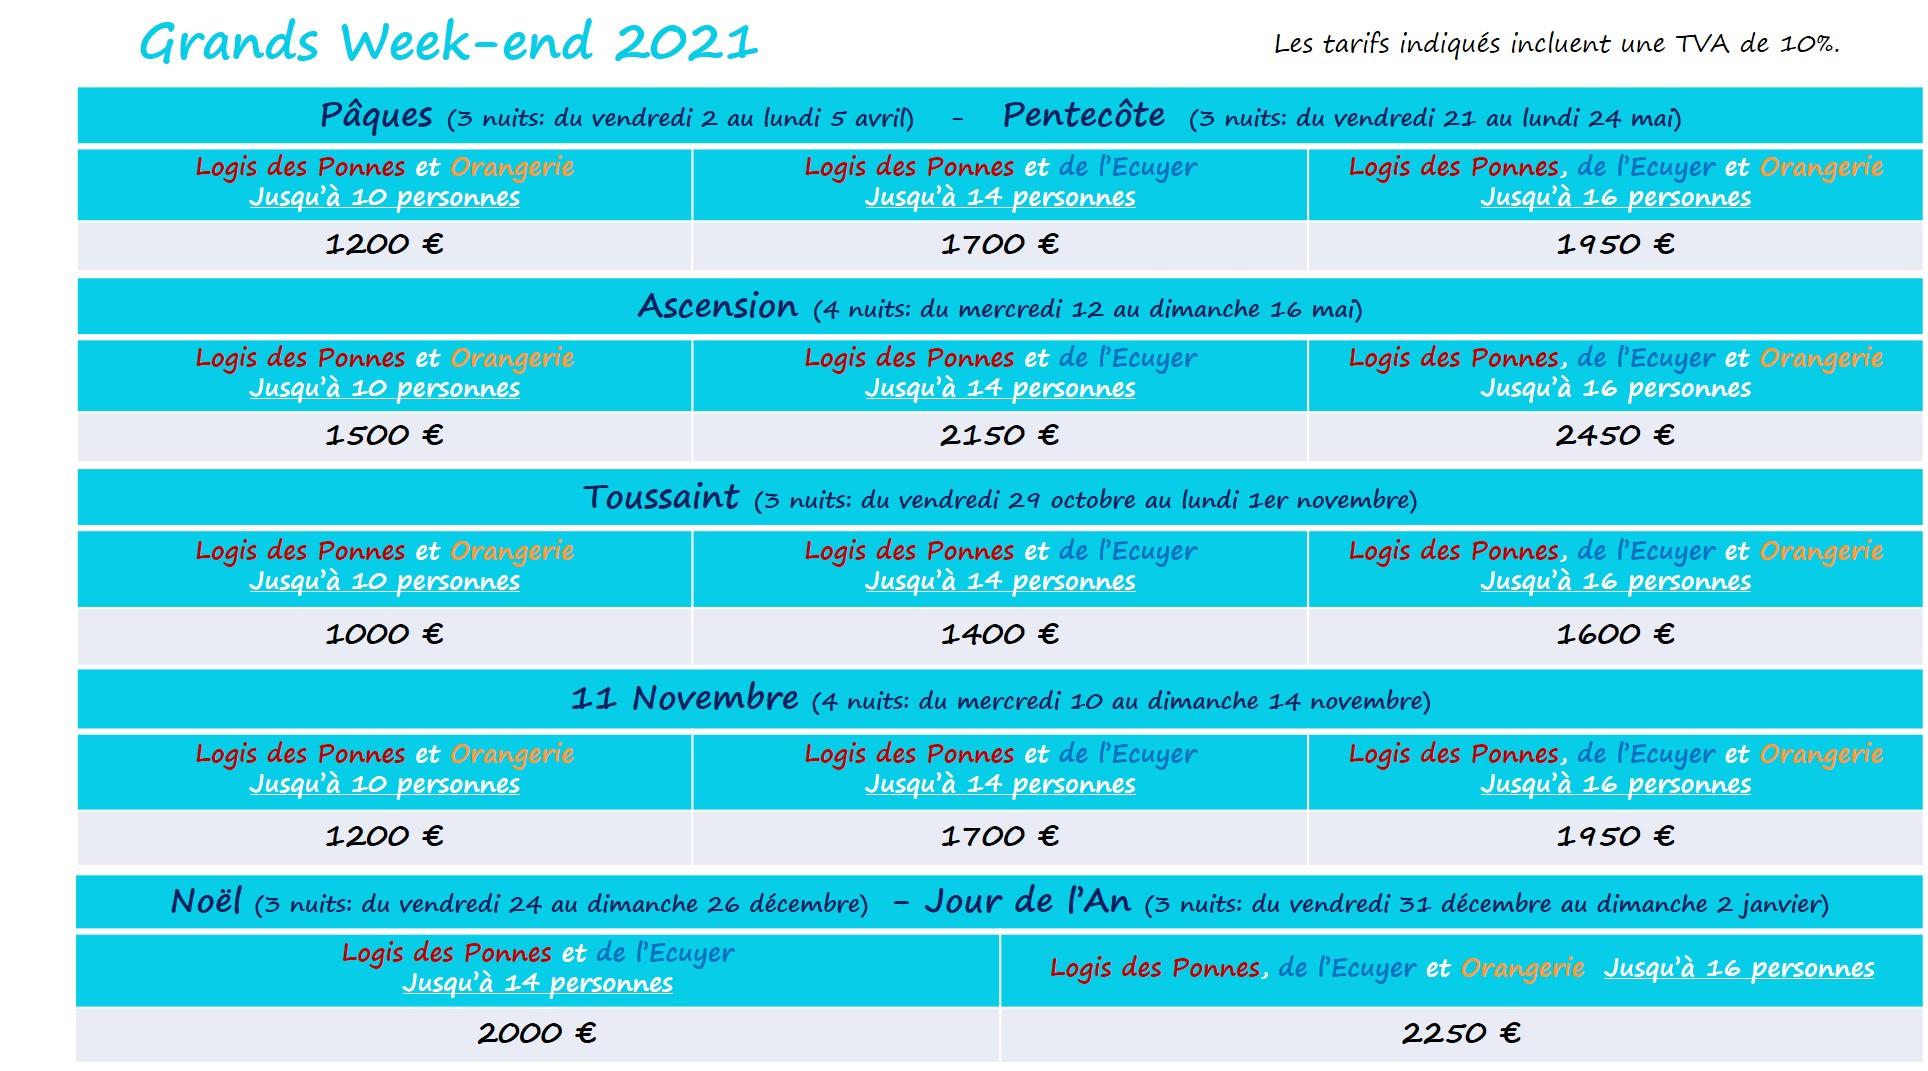 Tarifs grands WE 2021 La Girardière en Vendée